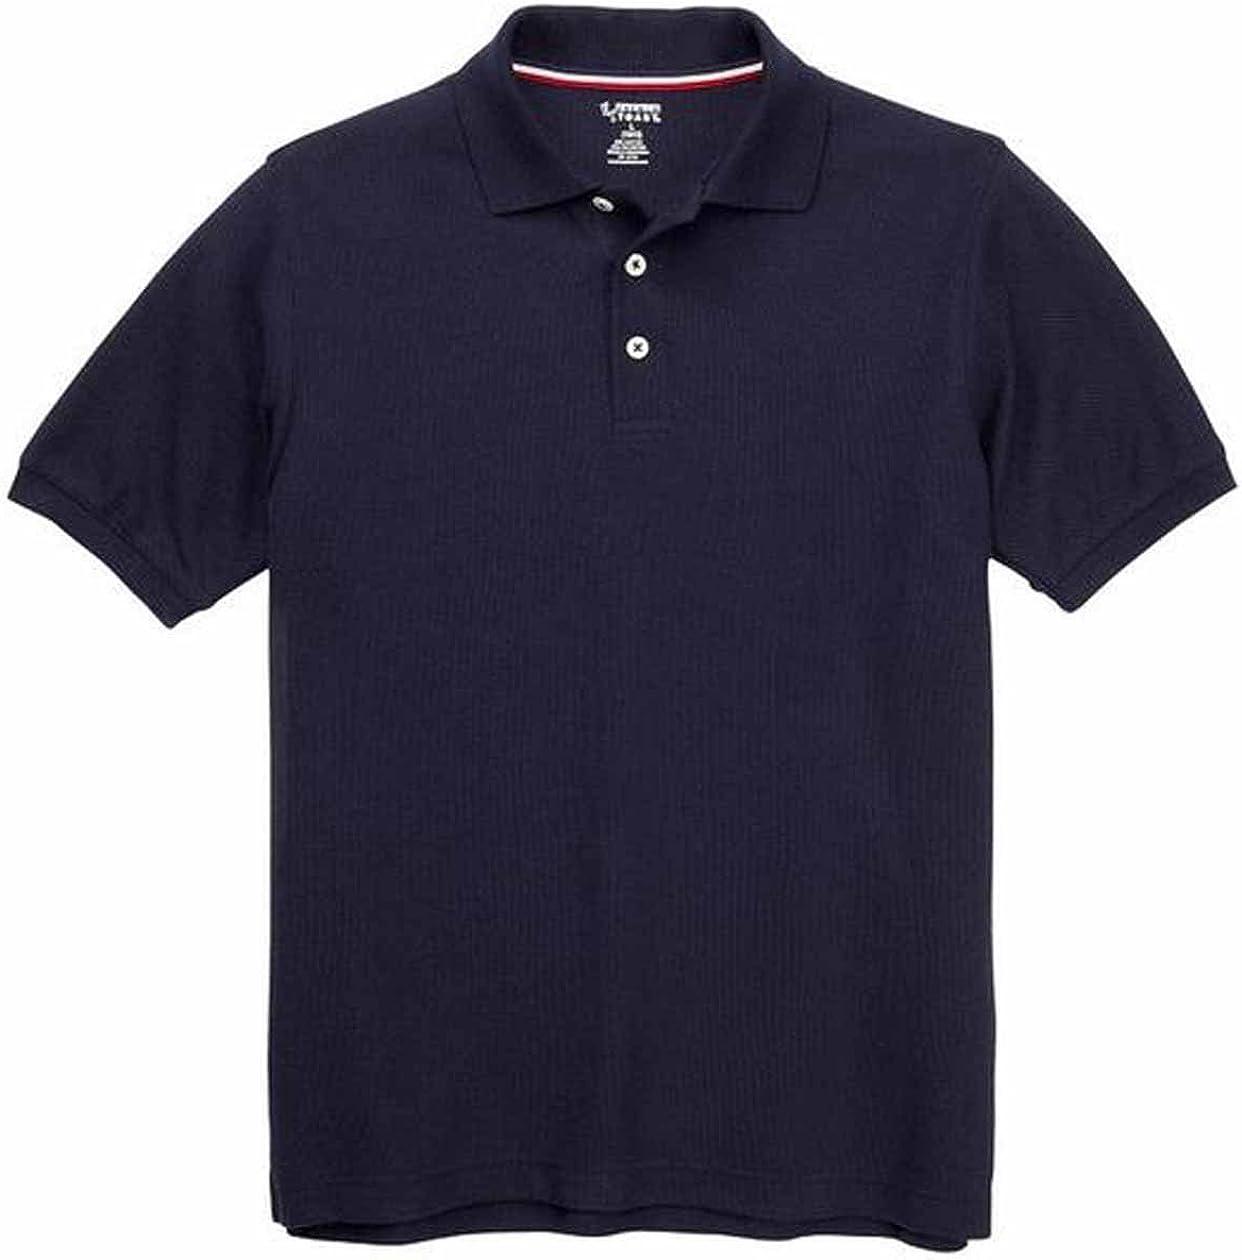 French Toast Boys Short Sleeve Shirt 2 Pack Polo's (XL (14/16), Navy)